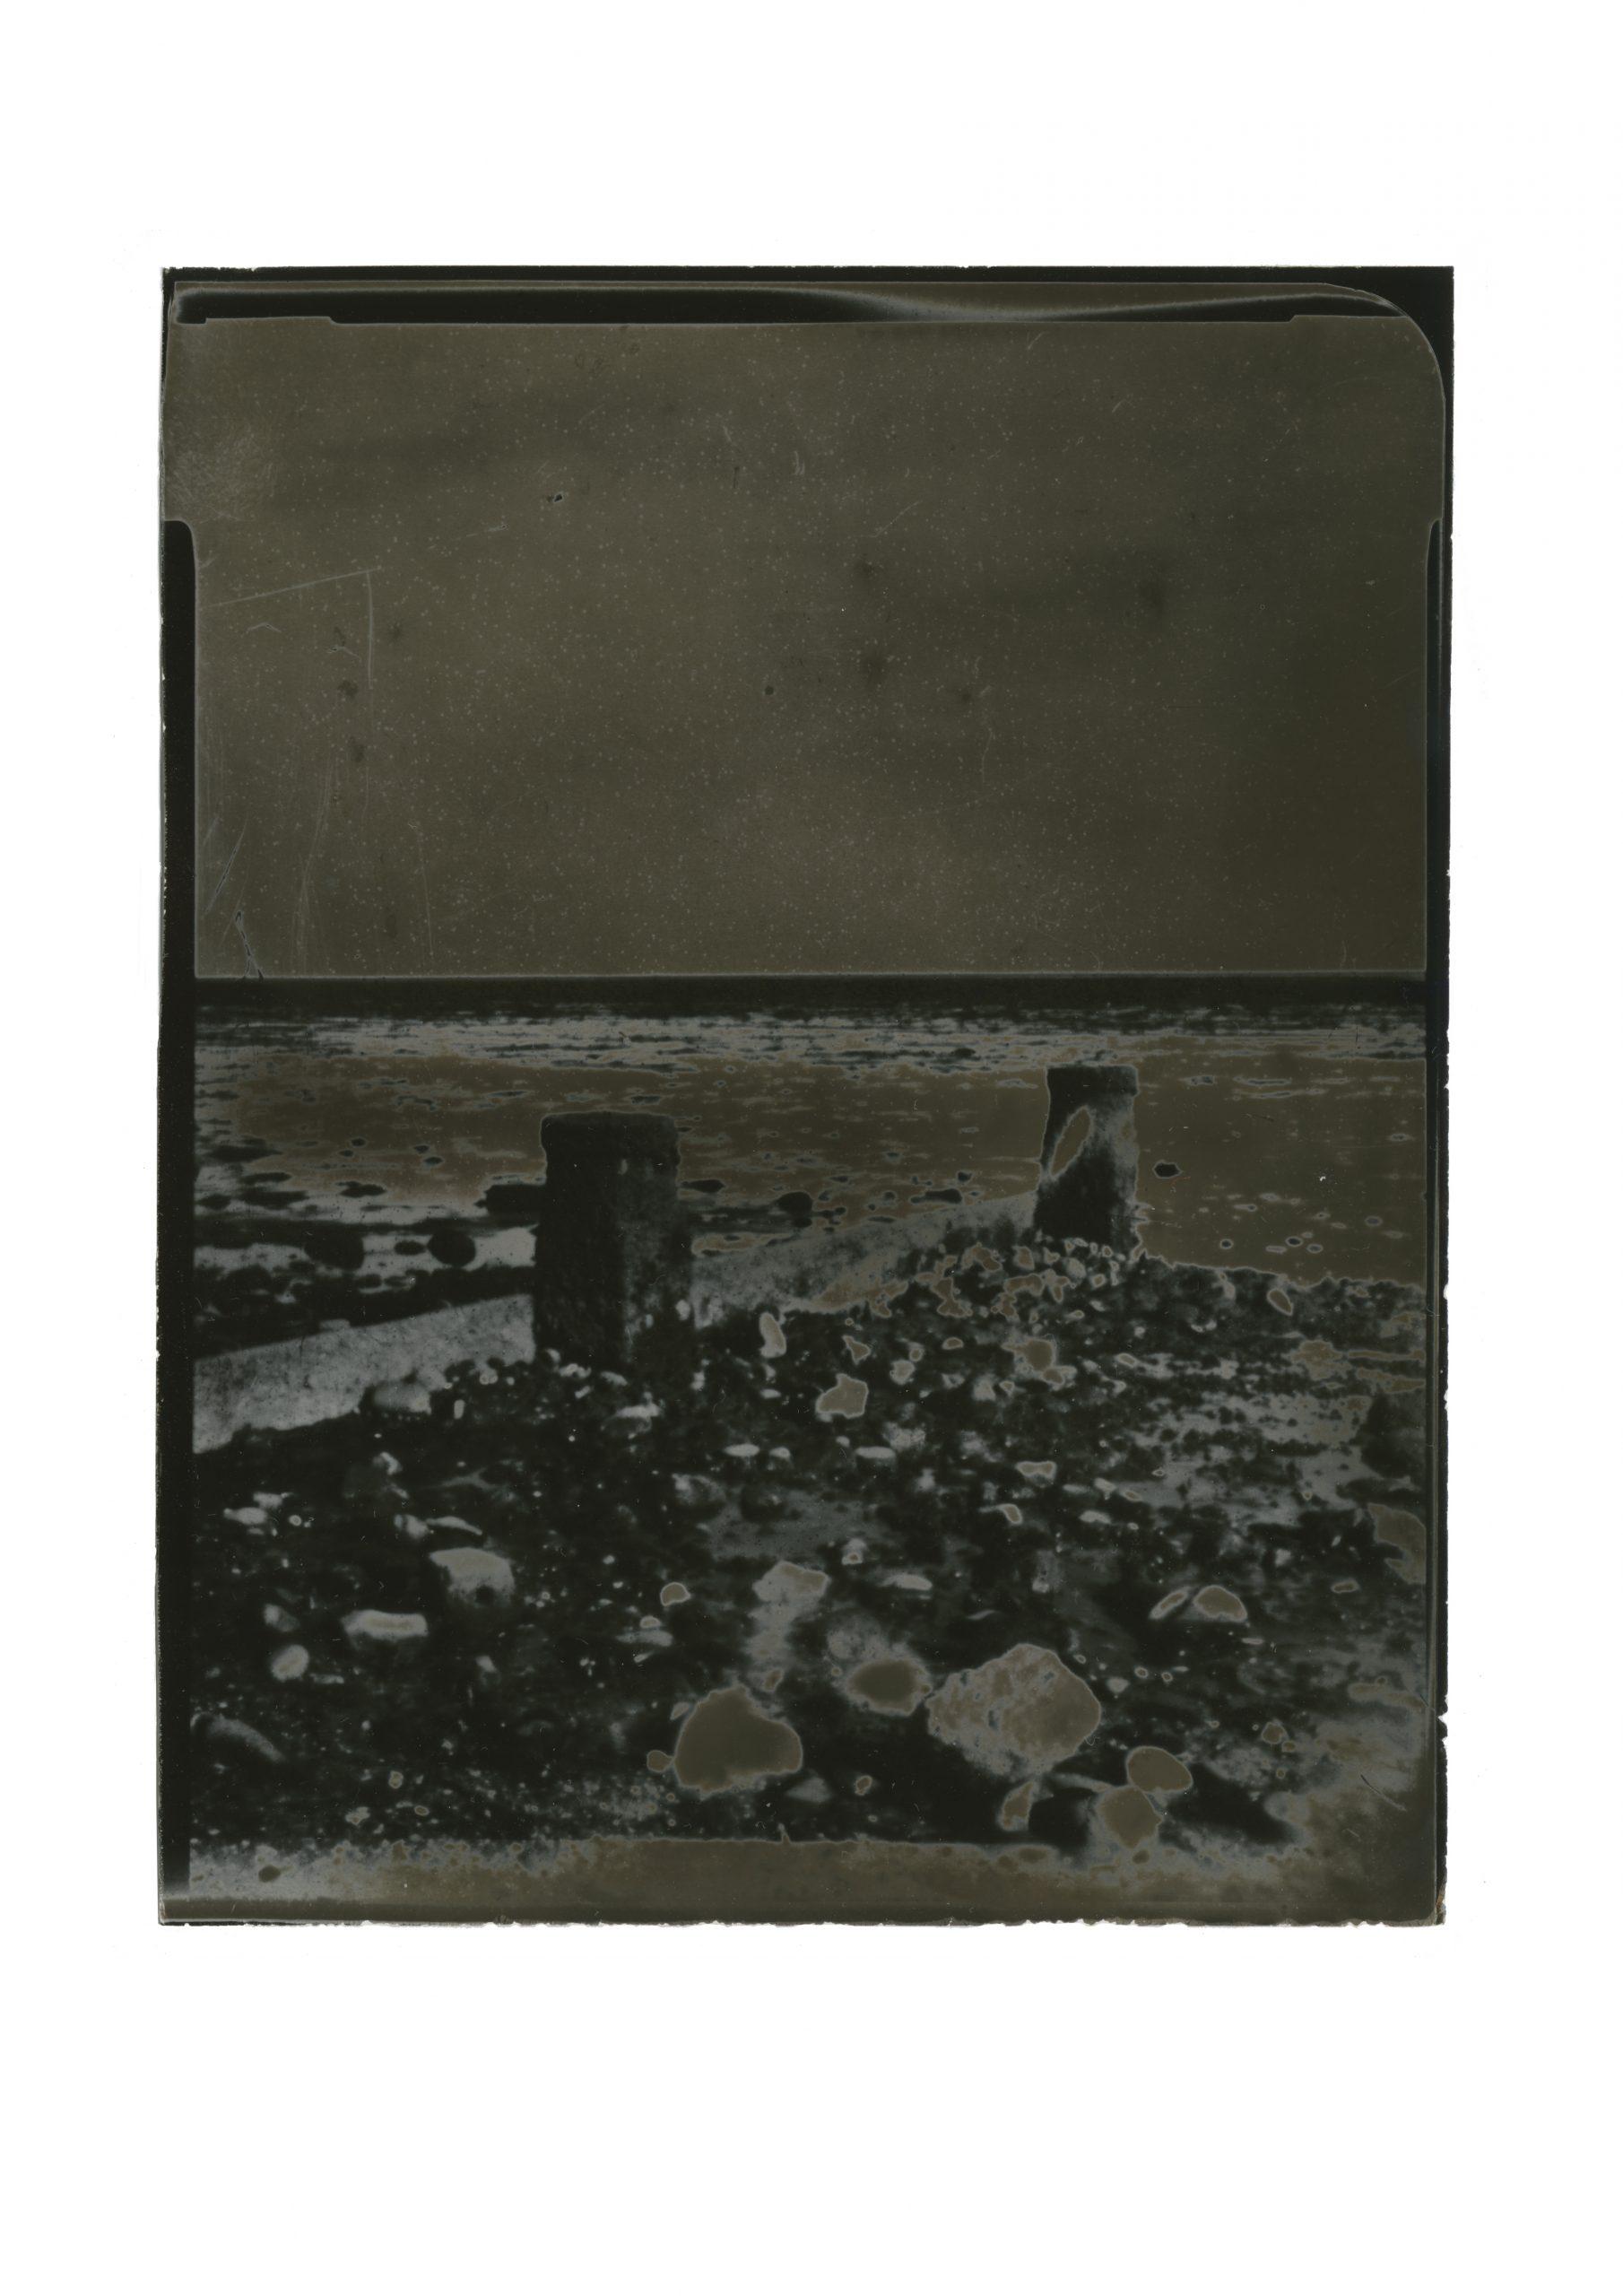 Dark solarized image of shingle beach, breakwaters and low tide against dark flat sky